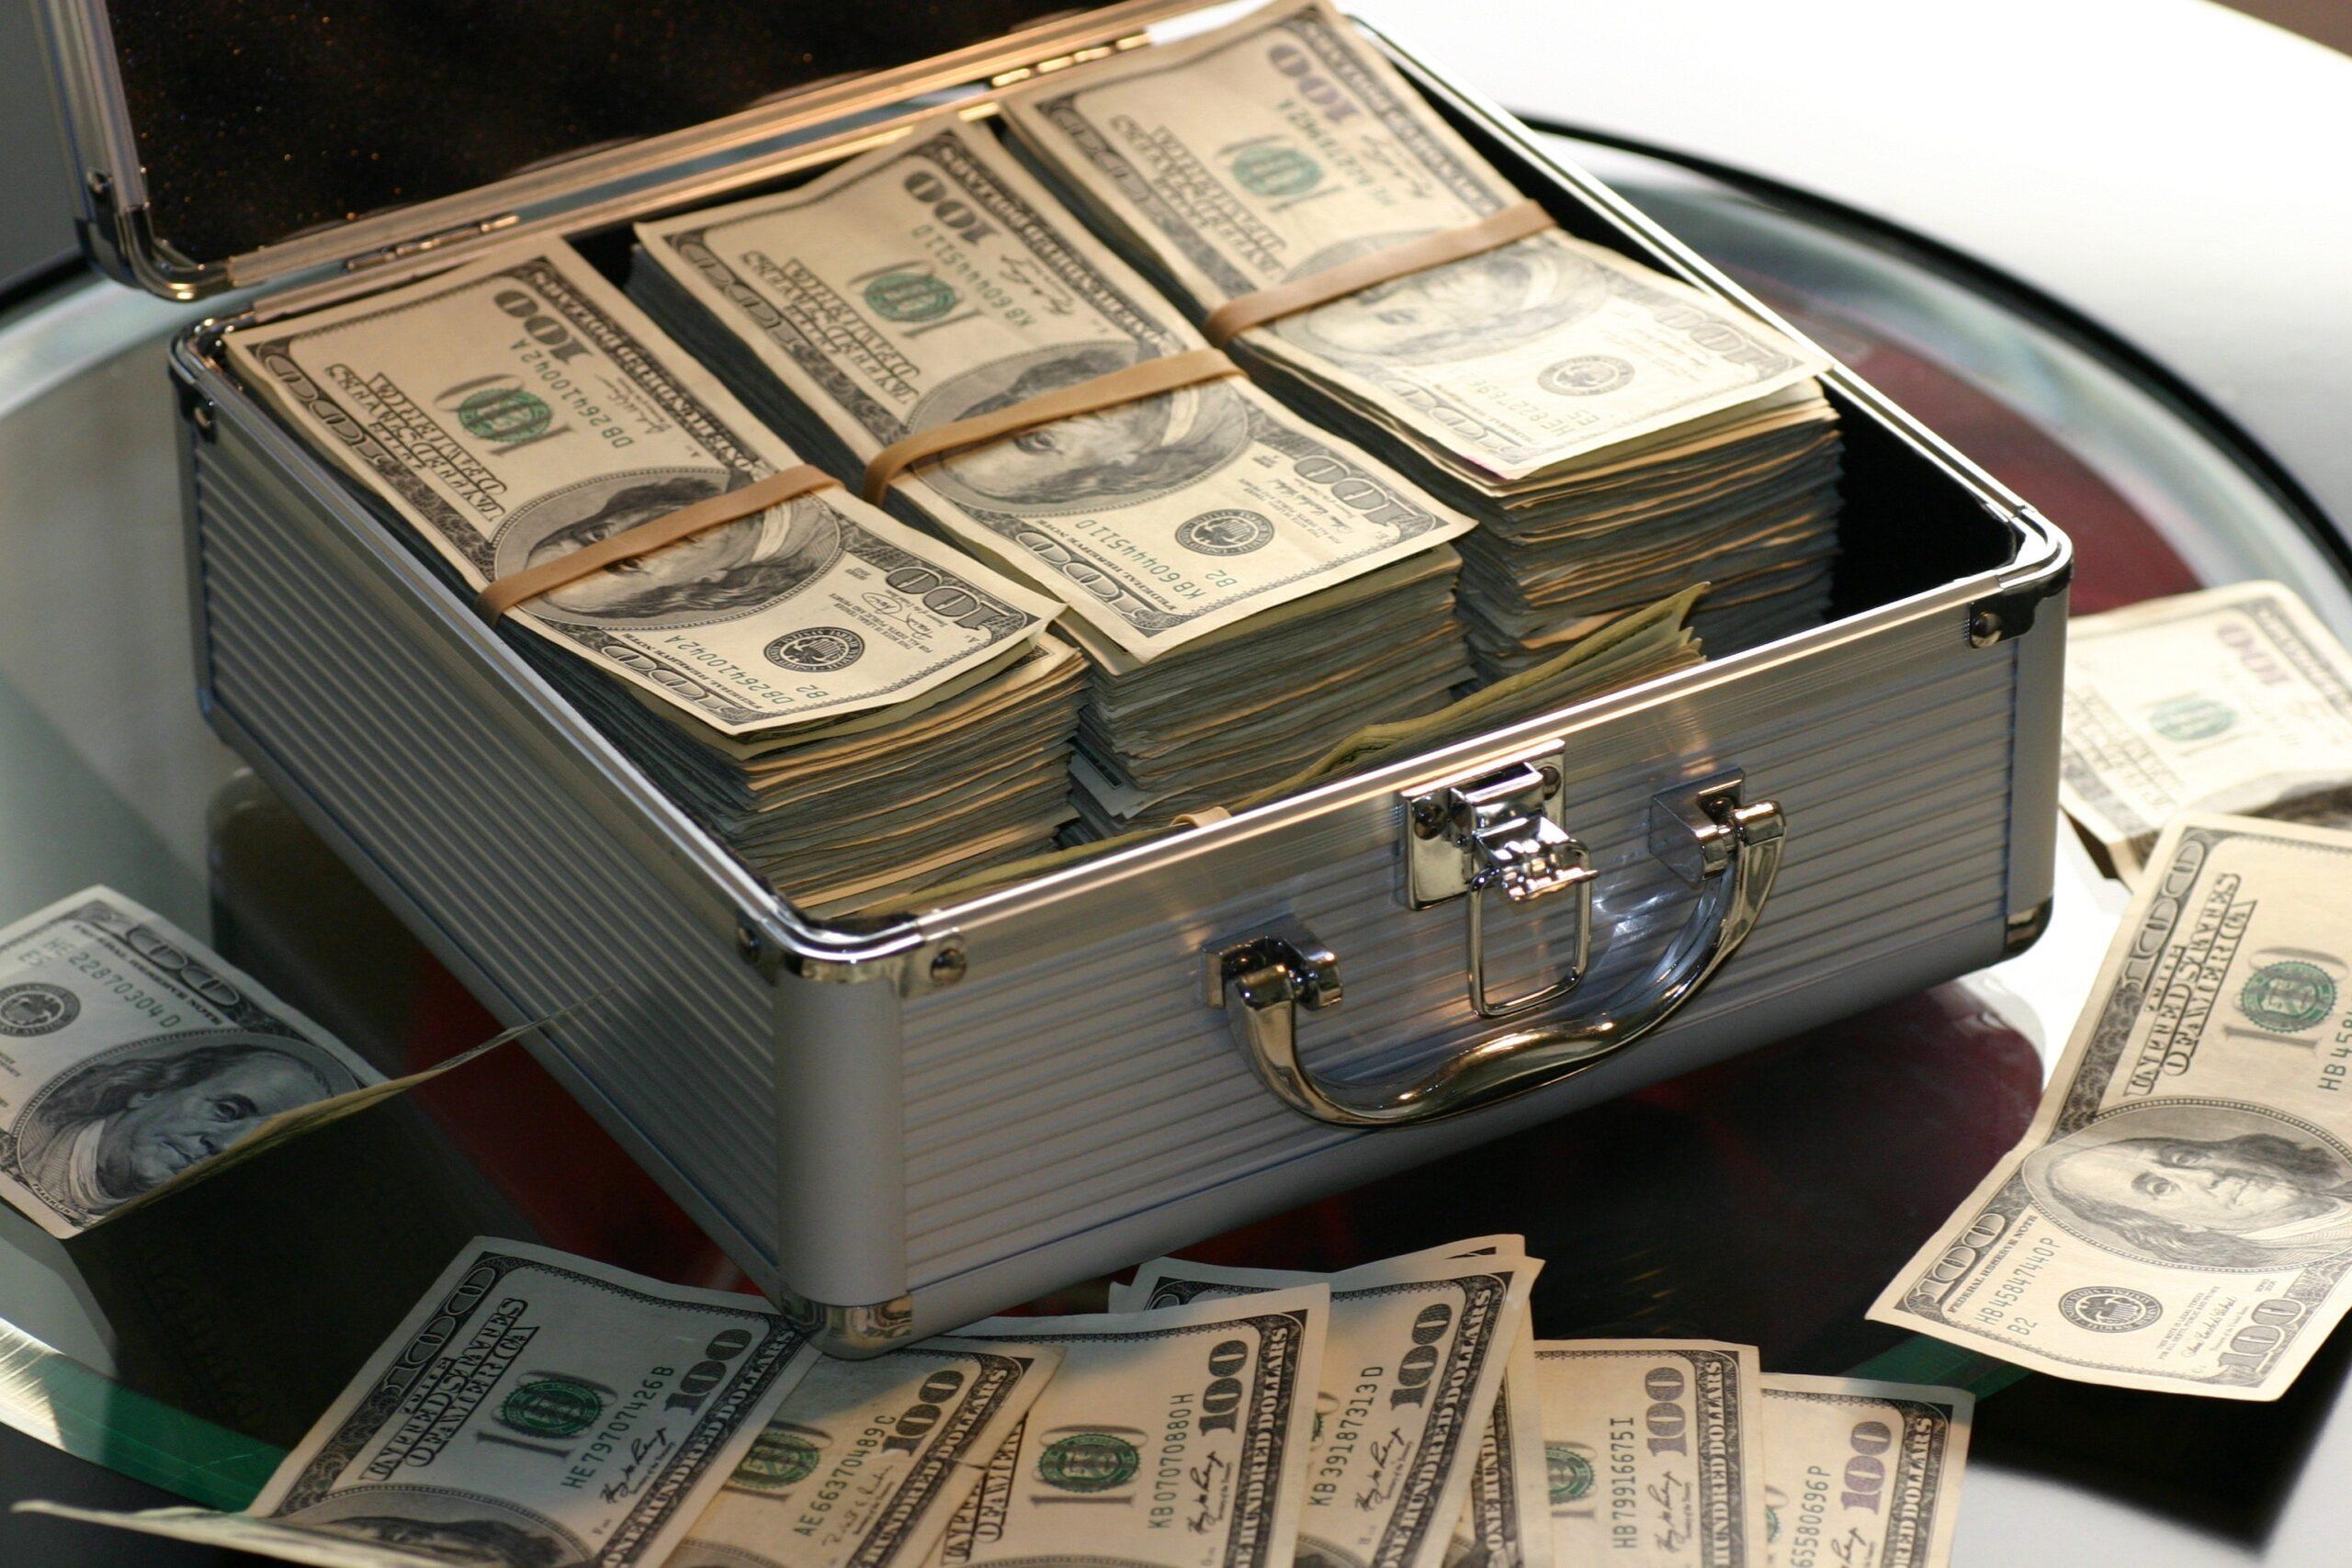 Antiwitwas banken iReto